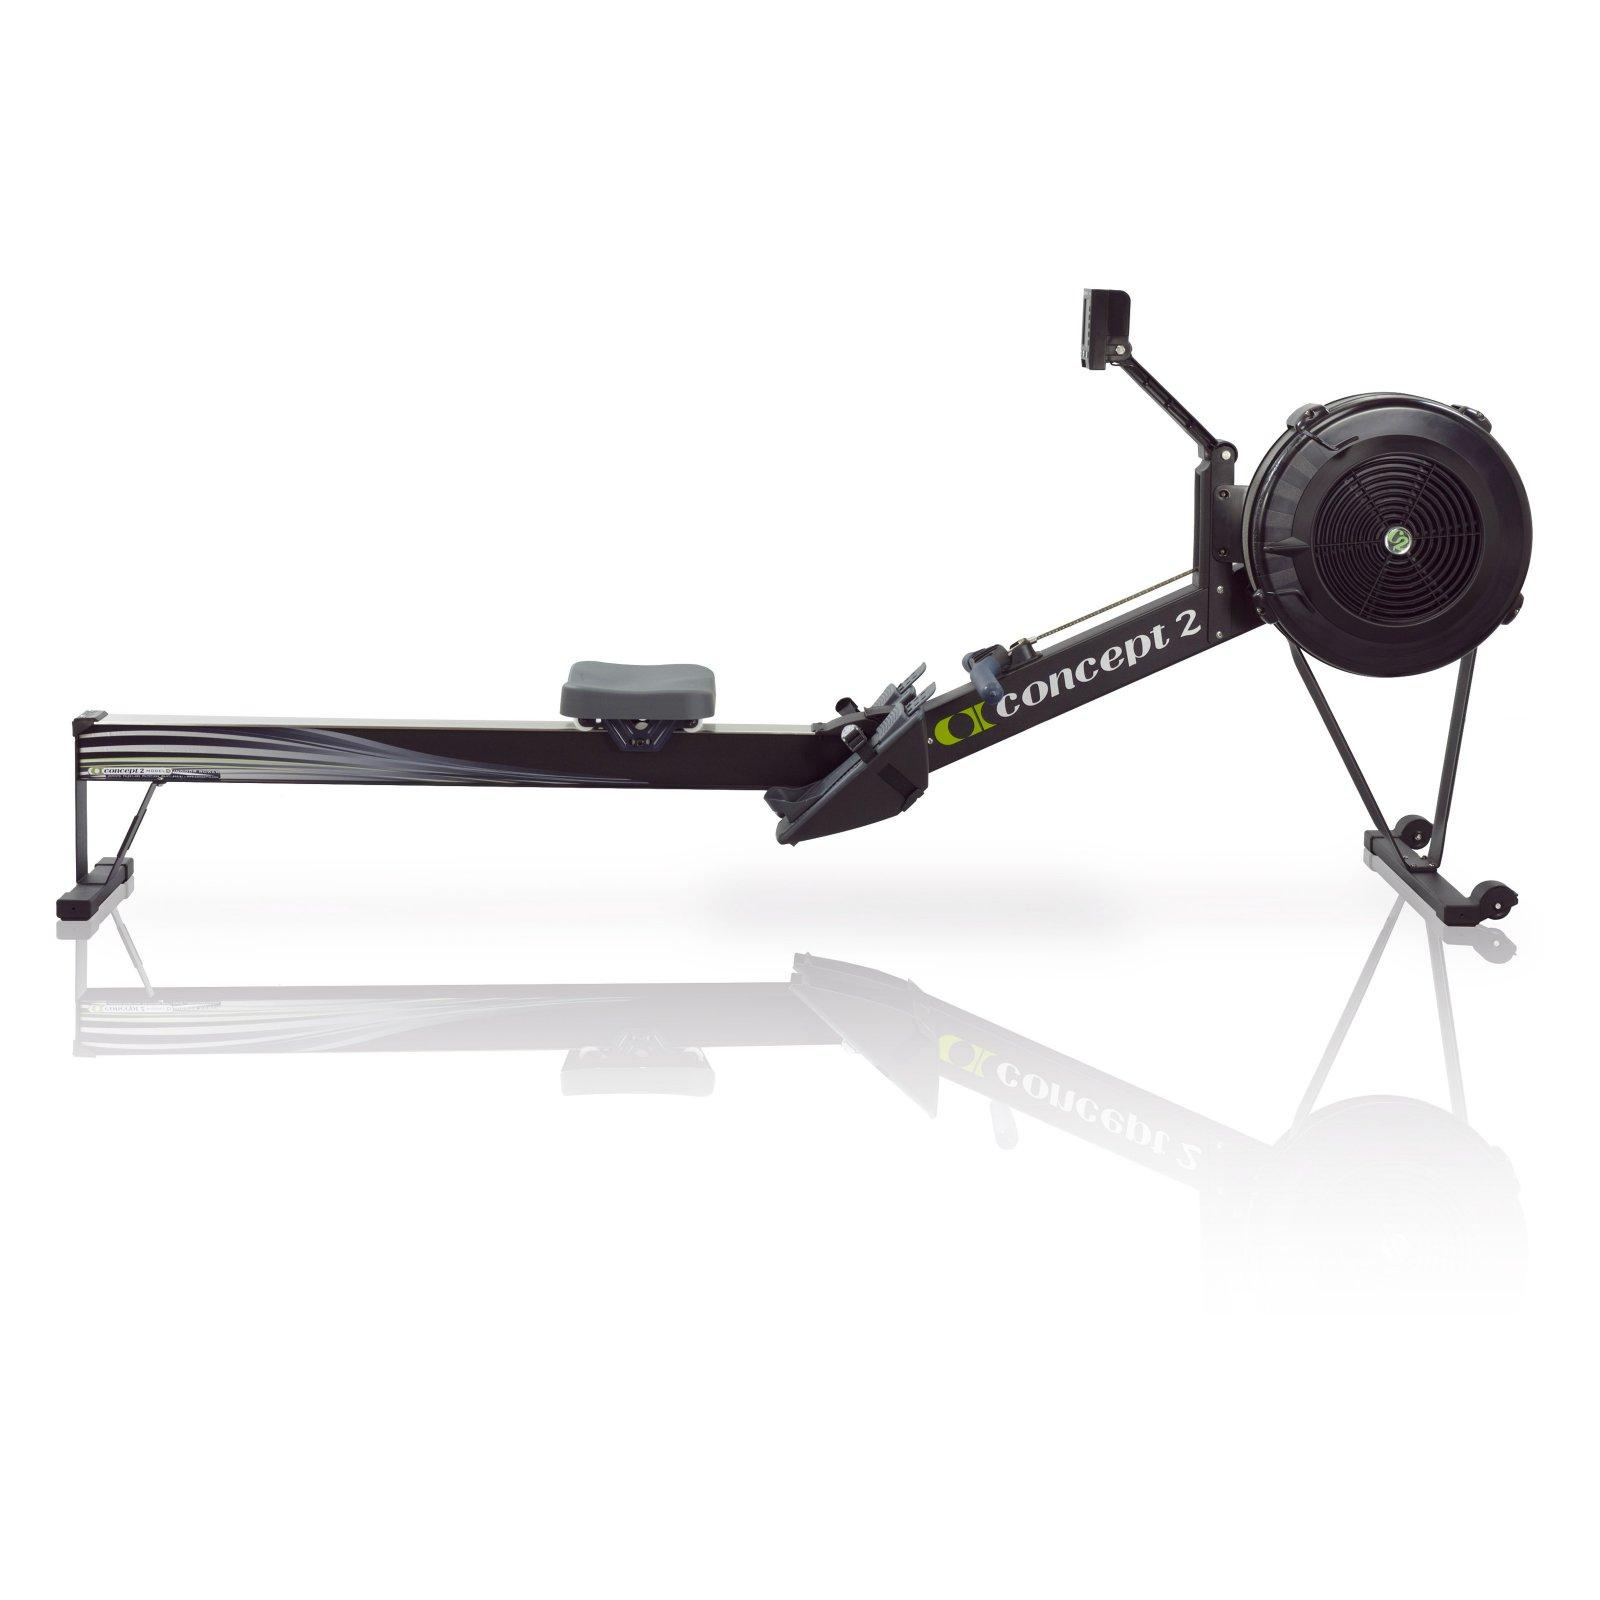 Concept 2 Model D Indoor Rowing Machine with PM5 Display